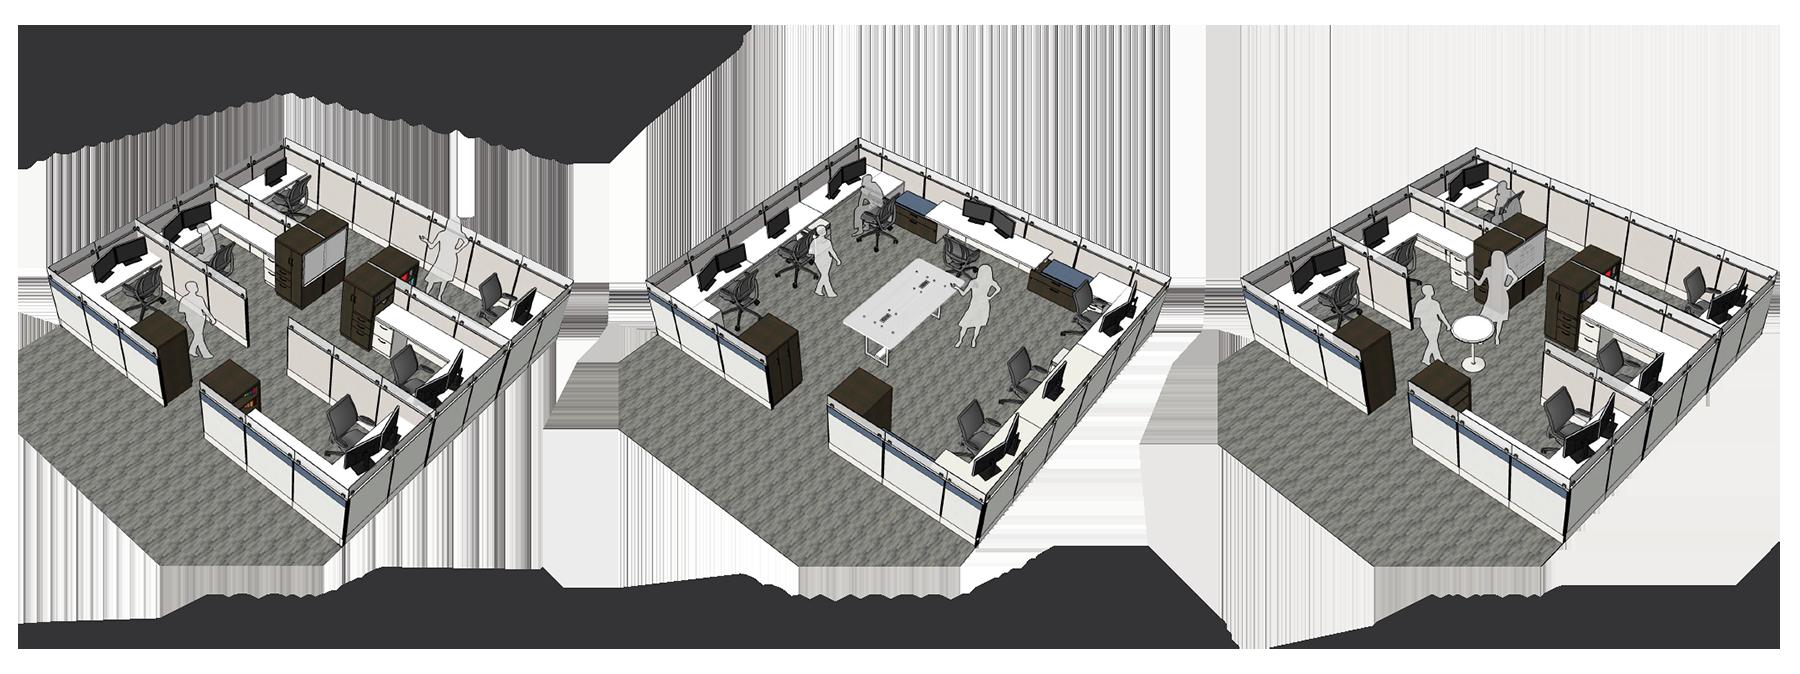 hbp-workstations.png